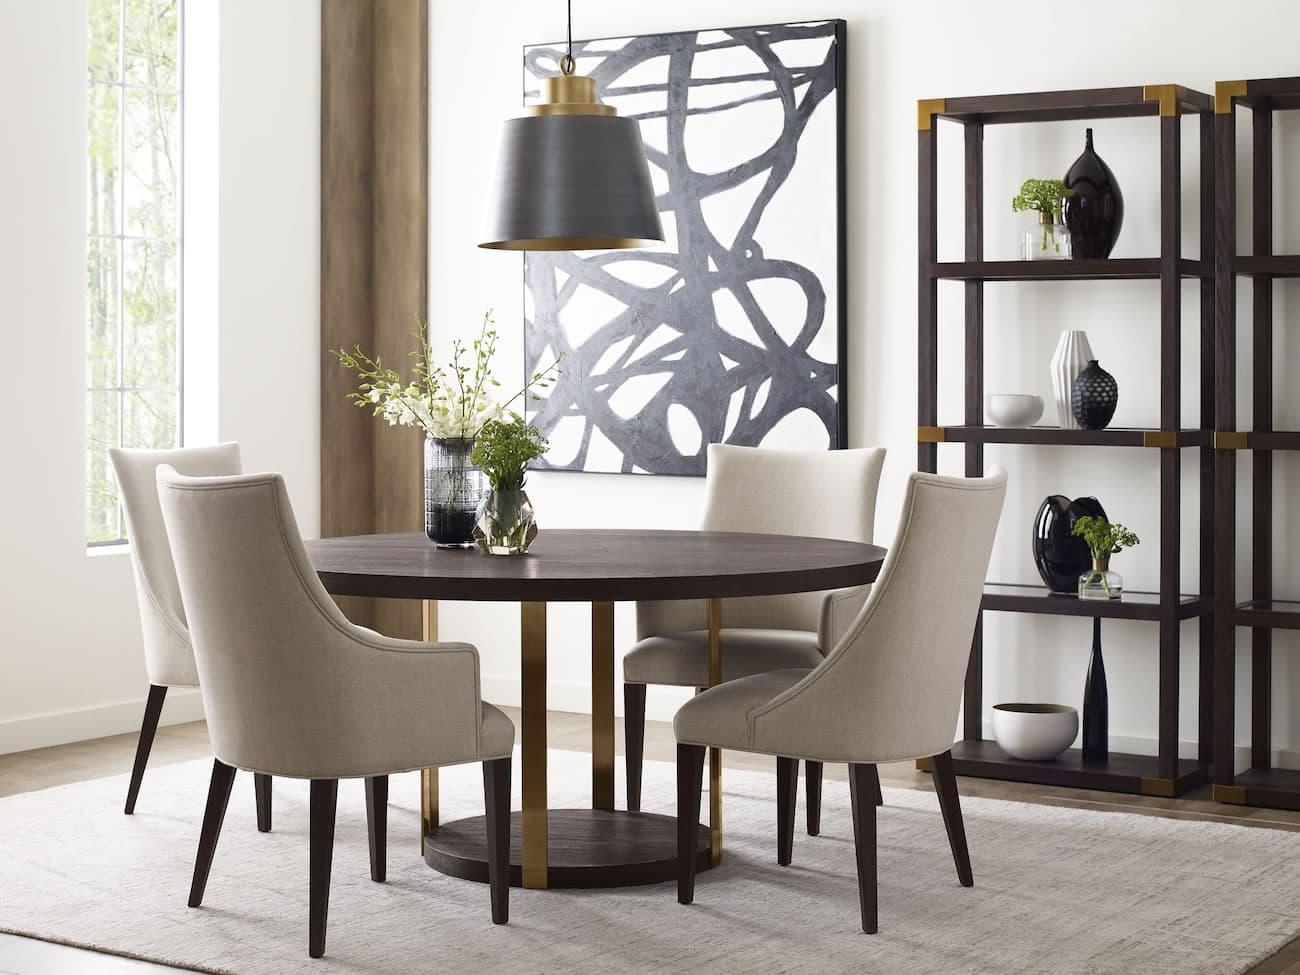 Dining-Theodore-Alexander-UrbanModern